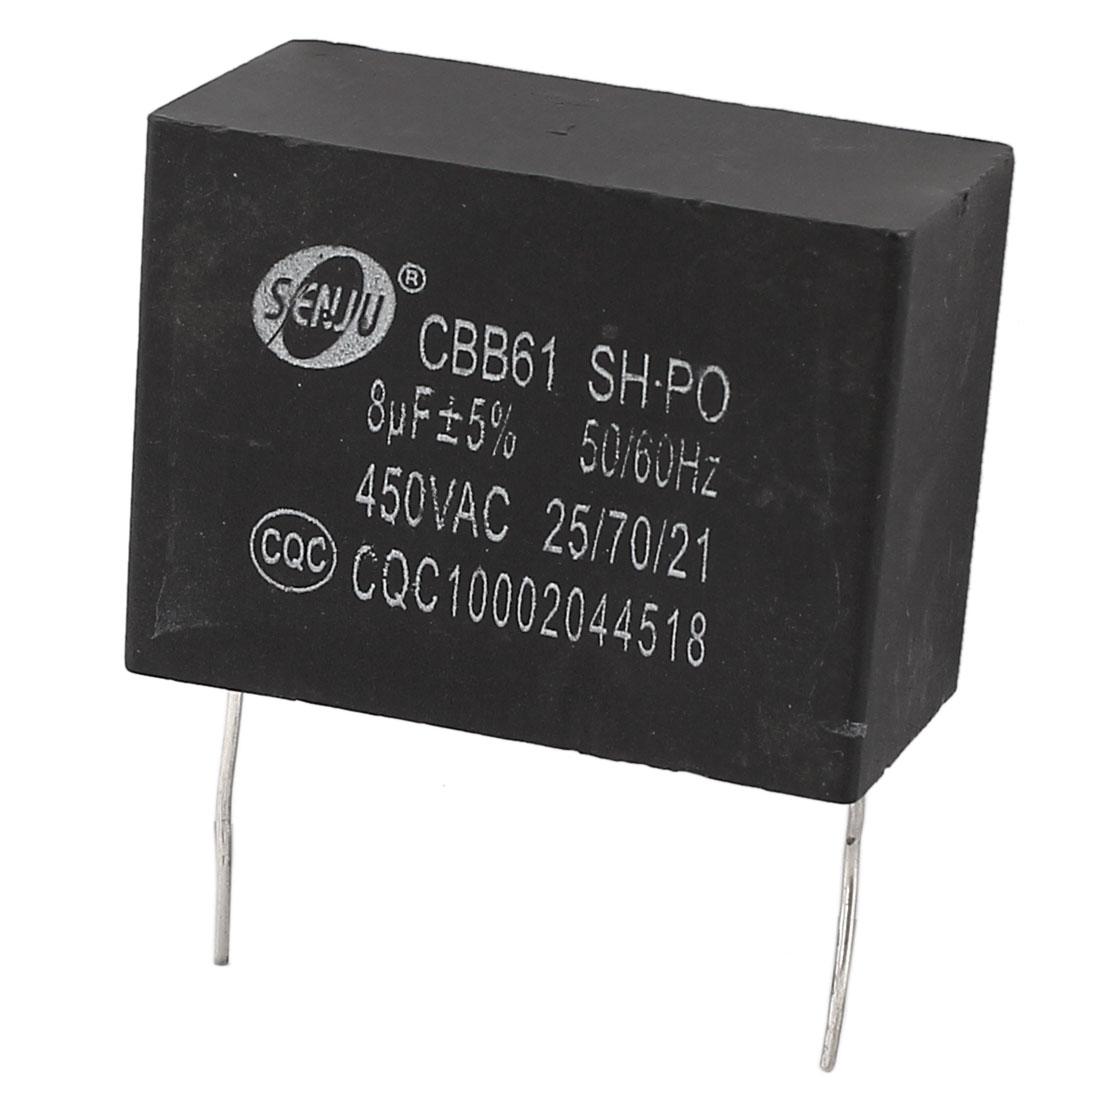 CBB61 AC 450V 8uF 50/60Hz Nonpolar Wired Motor Run Capacitor Black for Fan